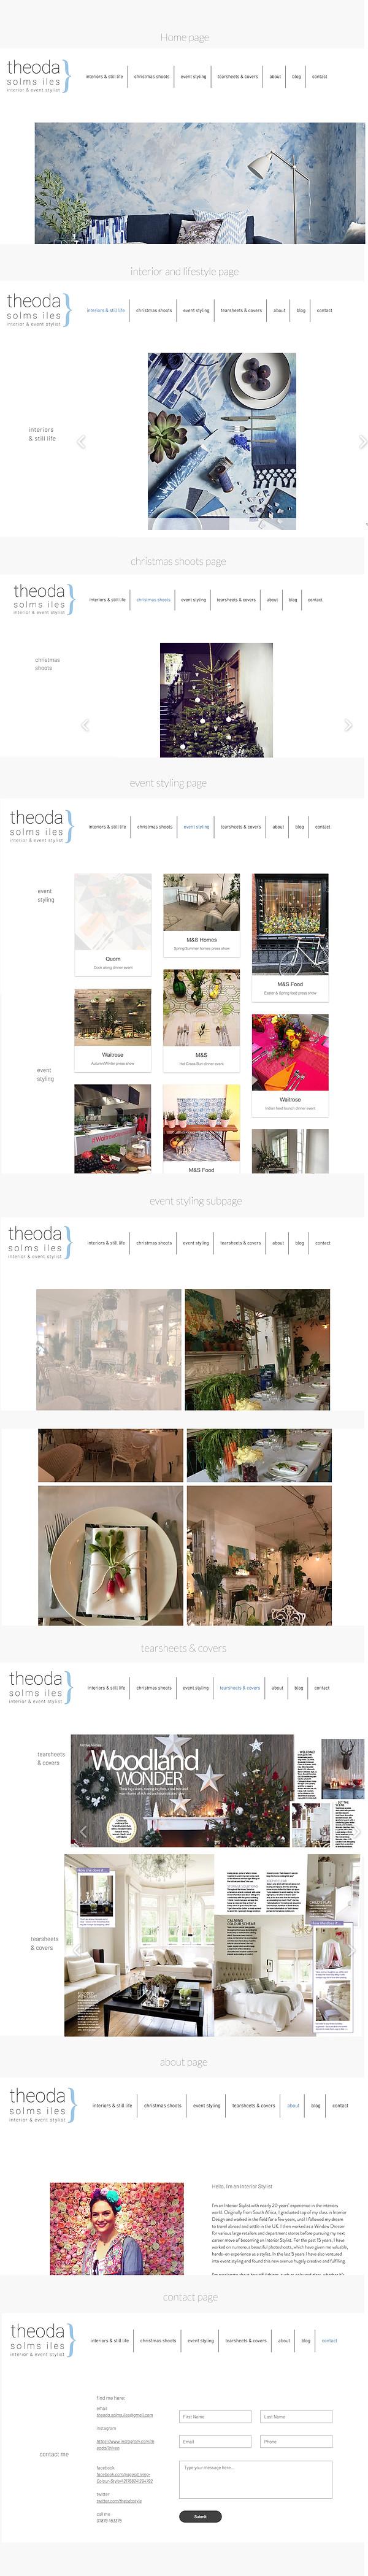 theoda website page.jpg